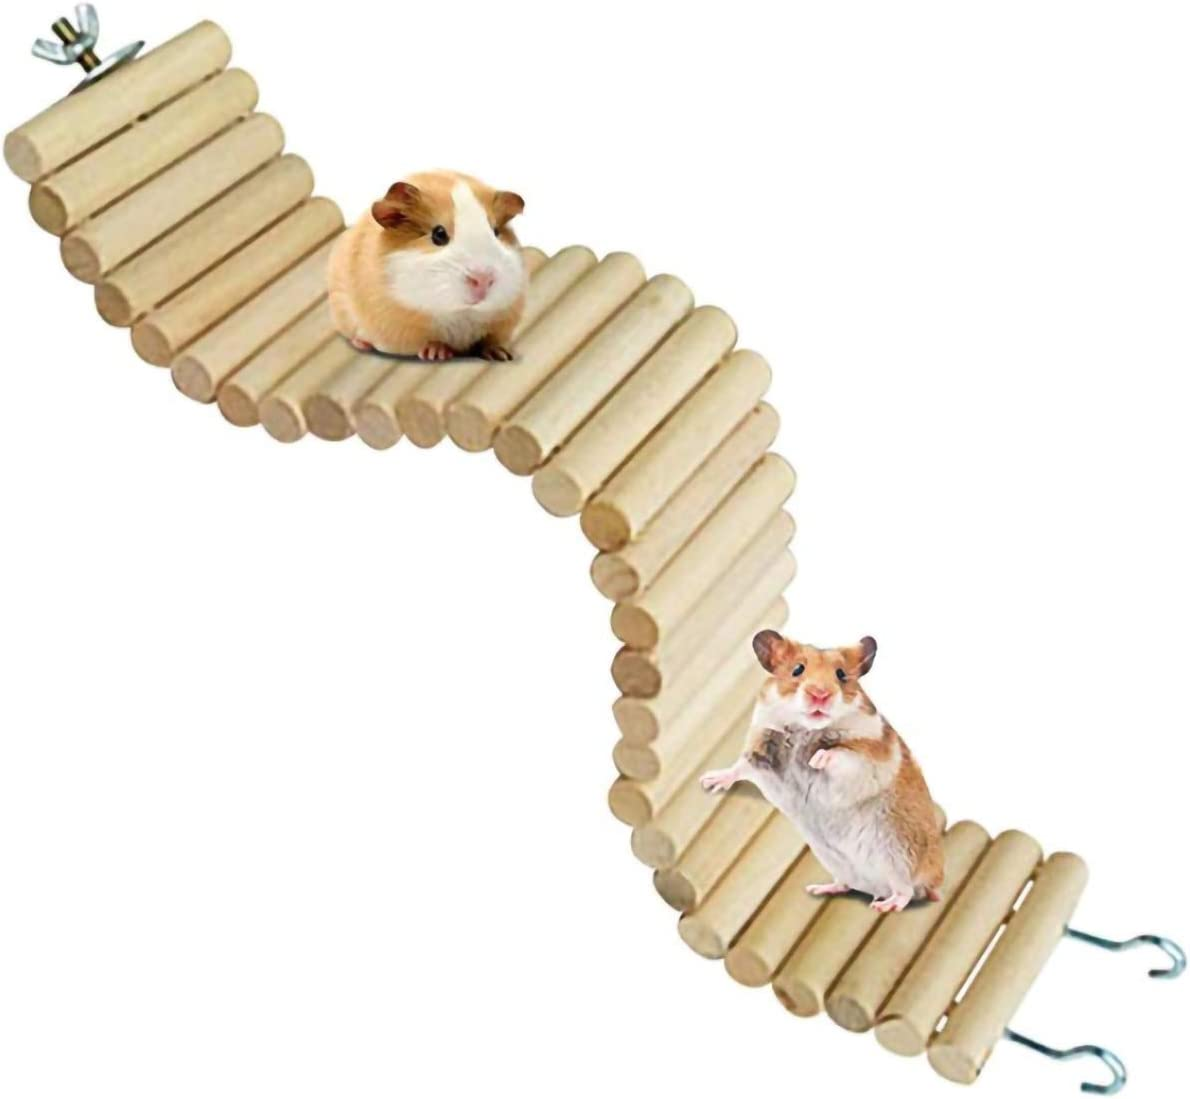 Cage Hanging Habitat Decor L, Colorful 01 Small Pet Teeth Chew Toys Colorful Suspension Bend Ladder Fushida Hamster Wooden Seesaw Bridge Platform